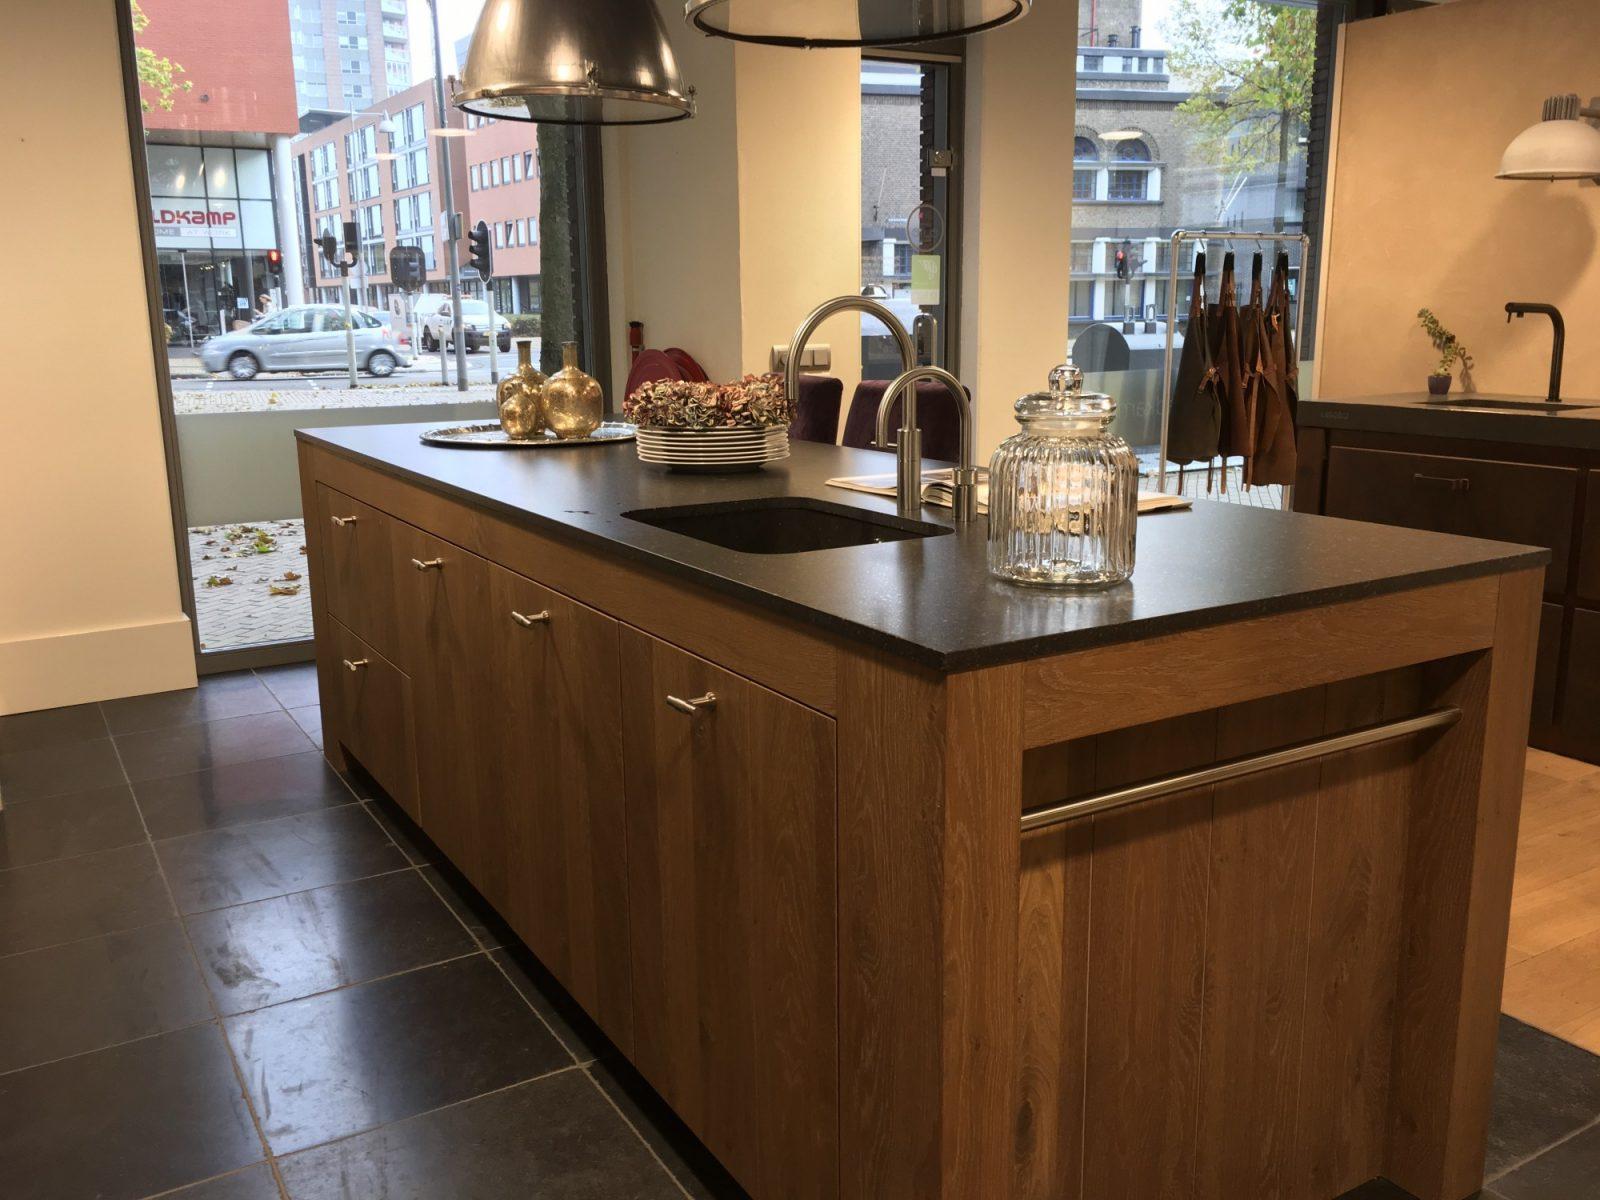 Jacob showroom keuken model madrid eiken gerookt afgelakt whitewash - Model keuken ...